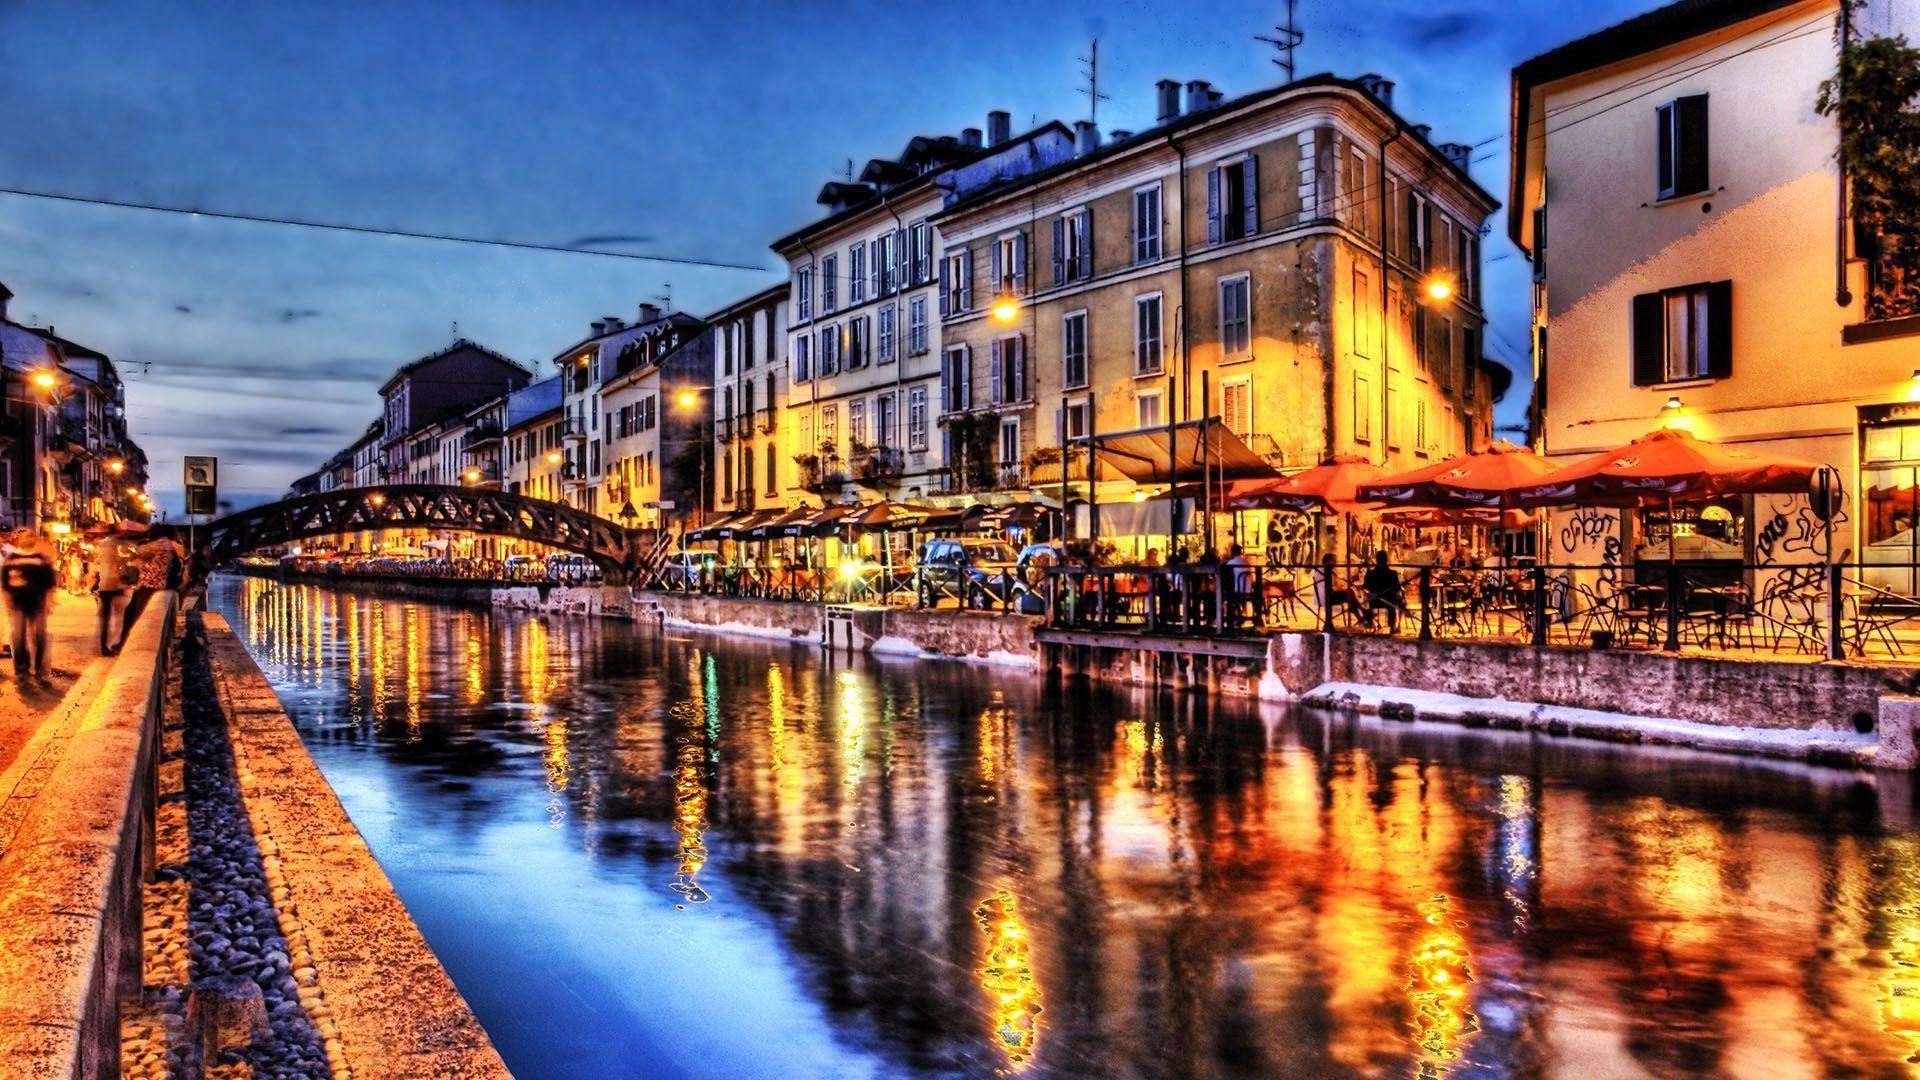 Venice italy at night venice at night wallpaper 304571 - Italy screensaver ...